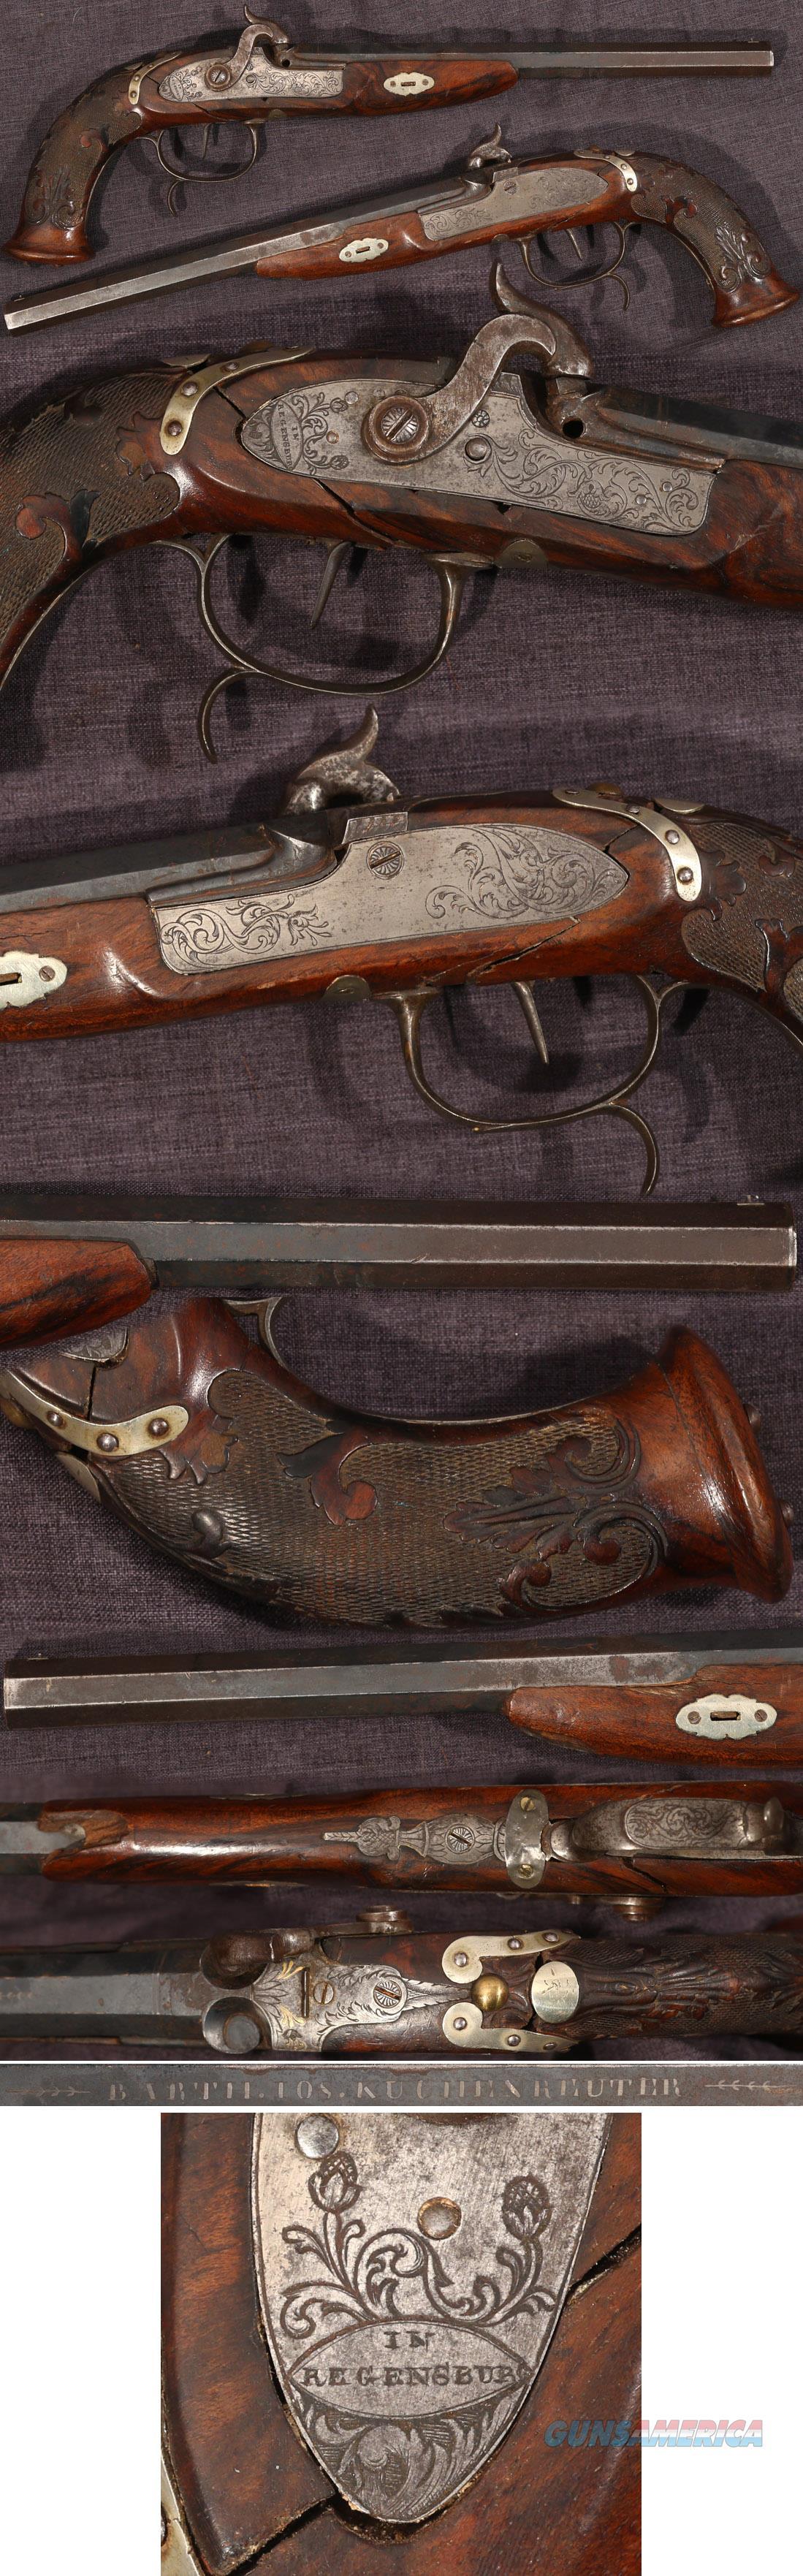 German percussion dueling pistol by Bartolomäus Joseph Kuchenreuter  Guns > Pistols > Muzzleloading Pre-1899 Pistols (perc)